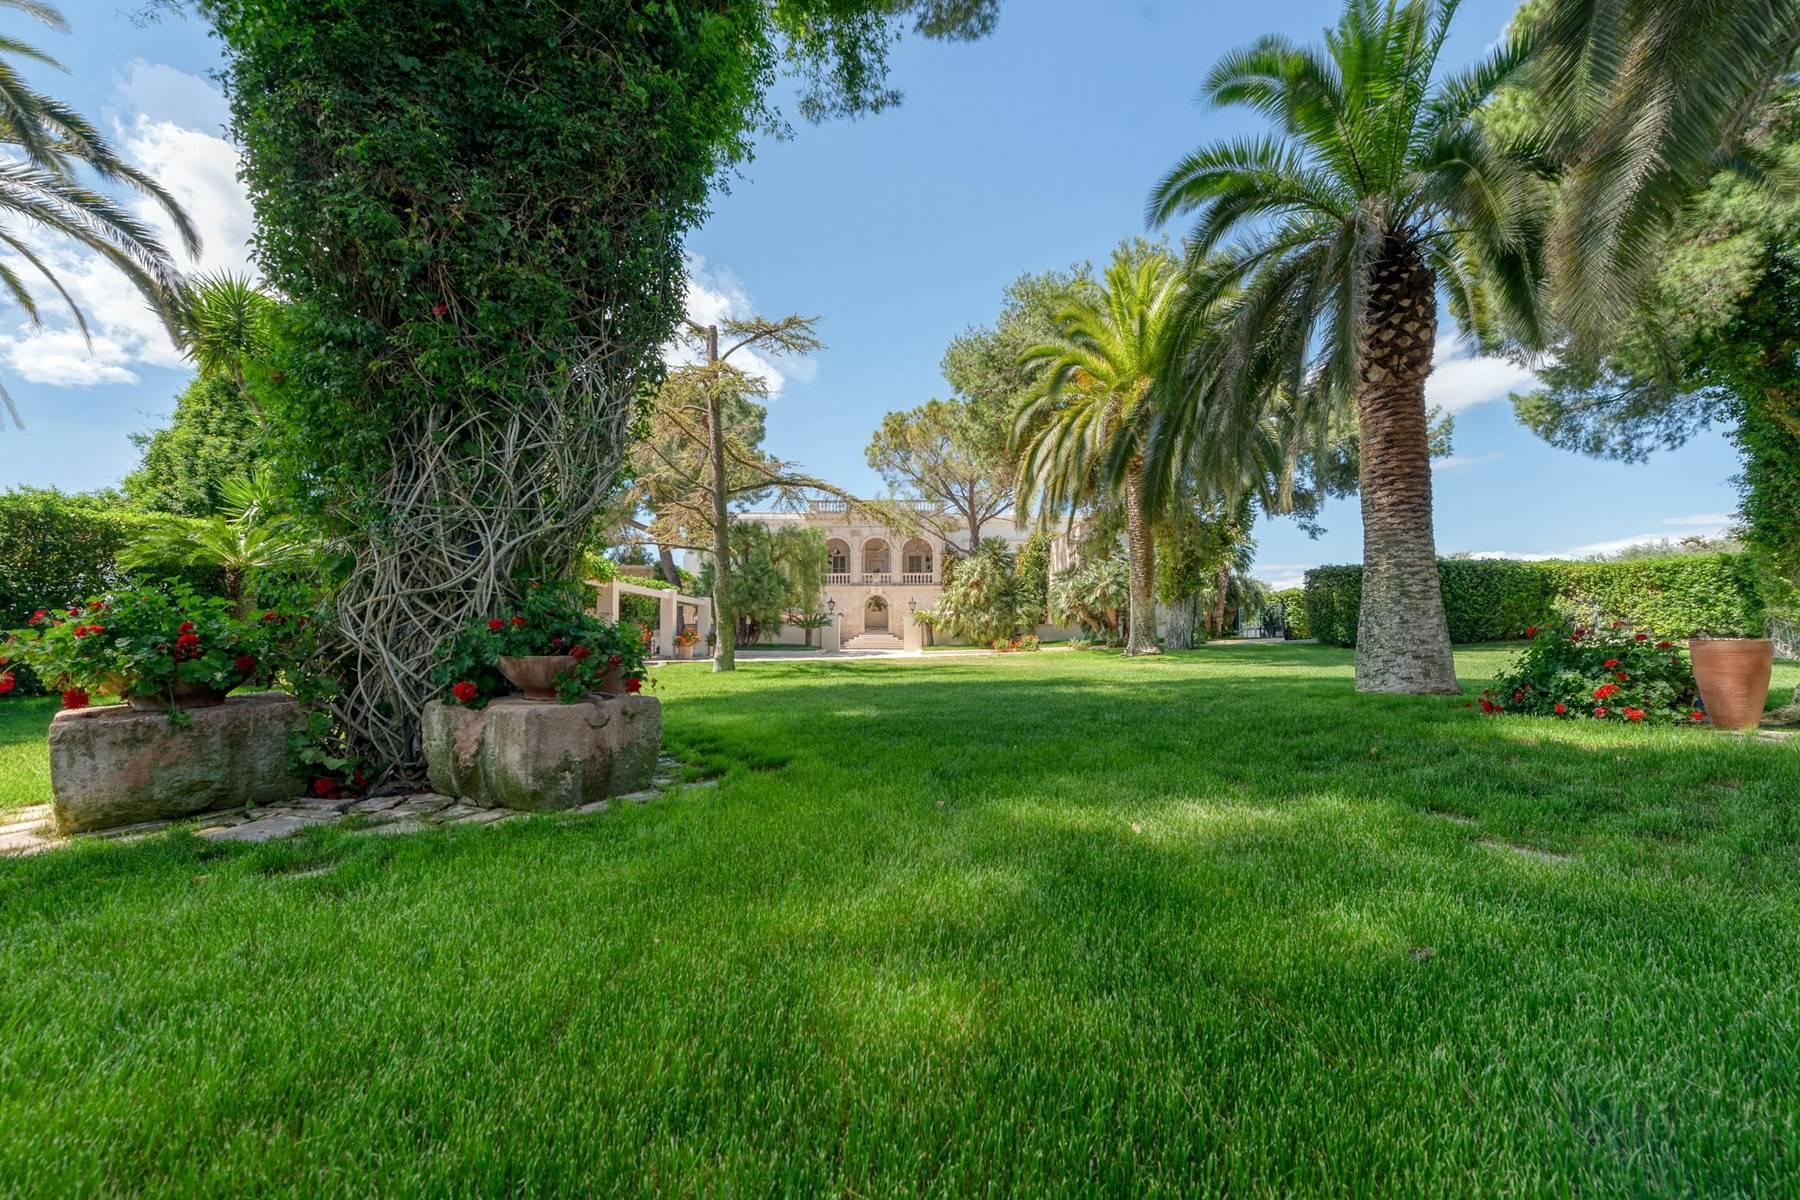 Splendida villa gentilizia del '600 circondata da agrumeti - 44